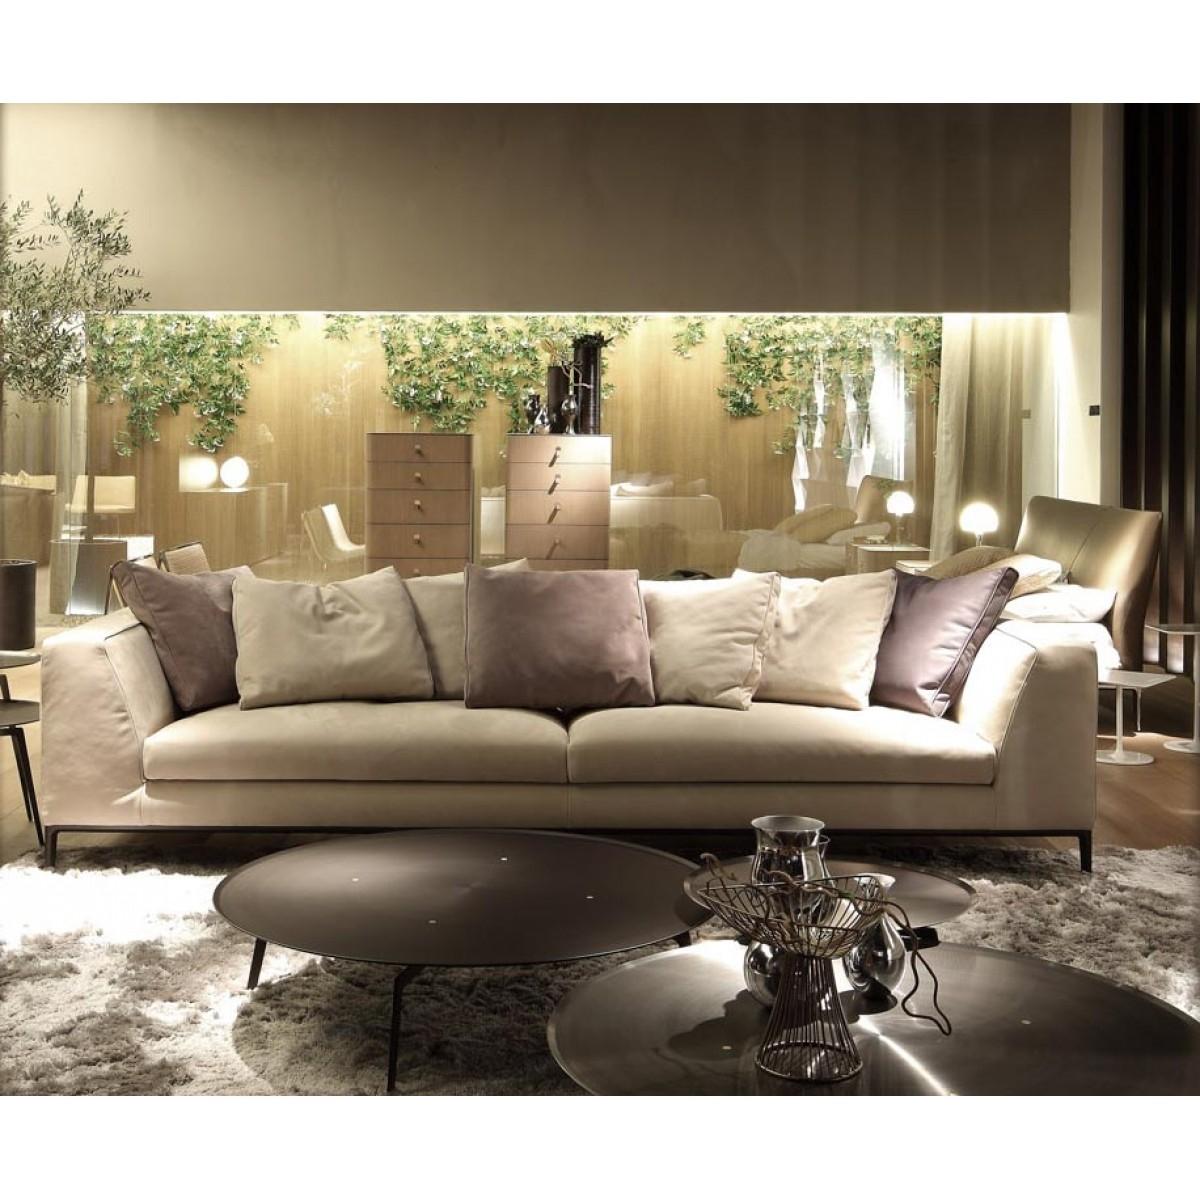 Cloud Extra Large Sofa | Large Sofa, Cloud And Interior Shop Regarding Extra Large Sofas (View 2 of 10)